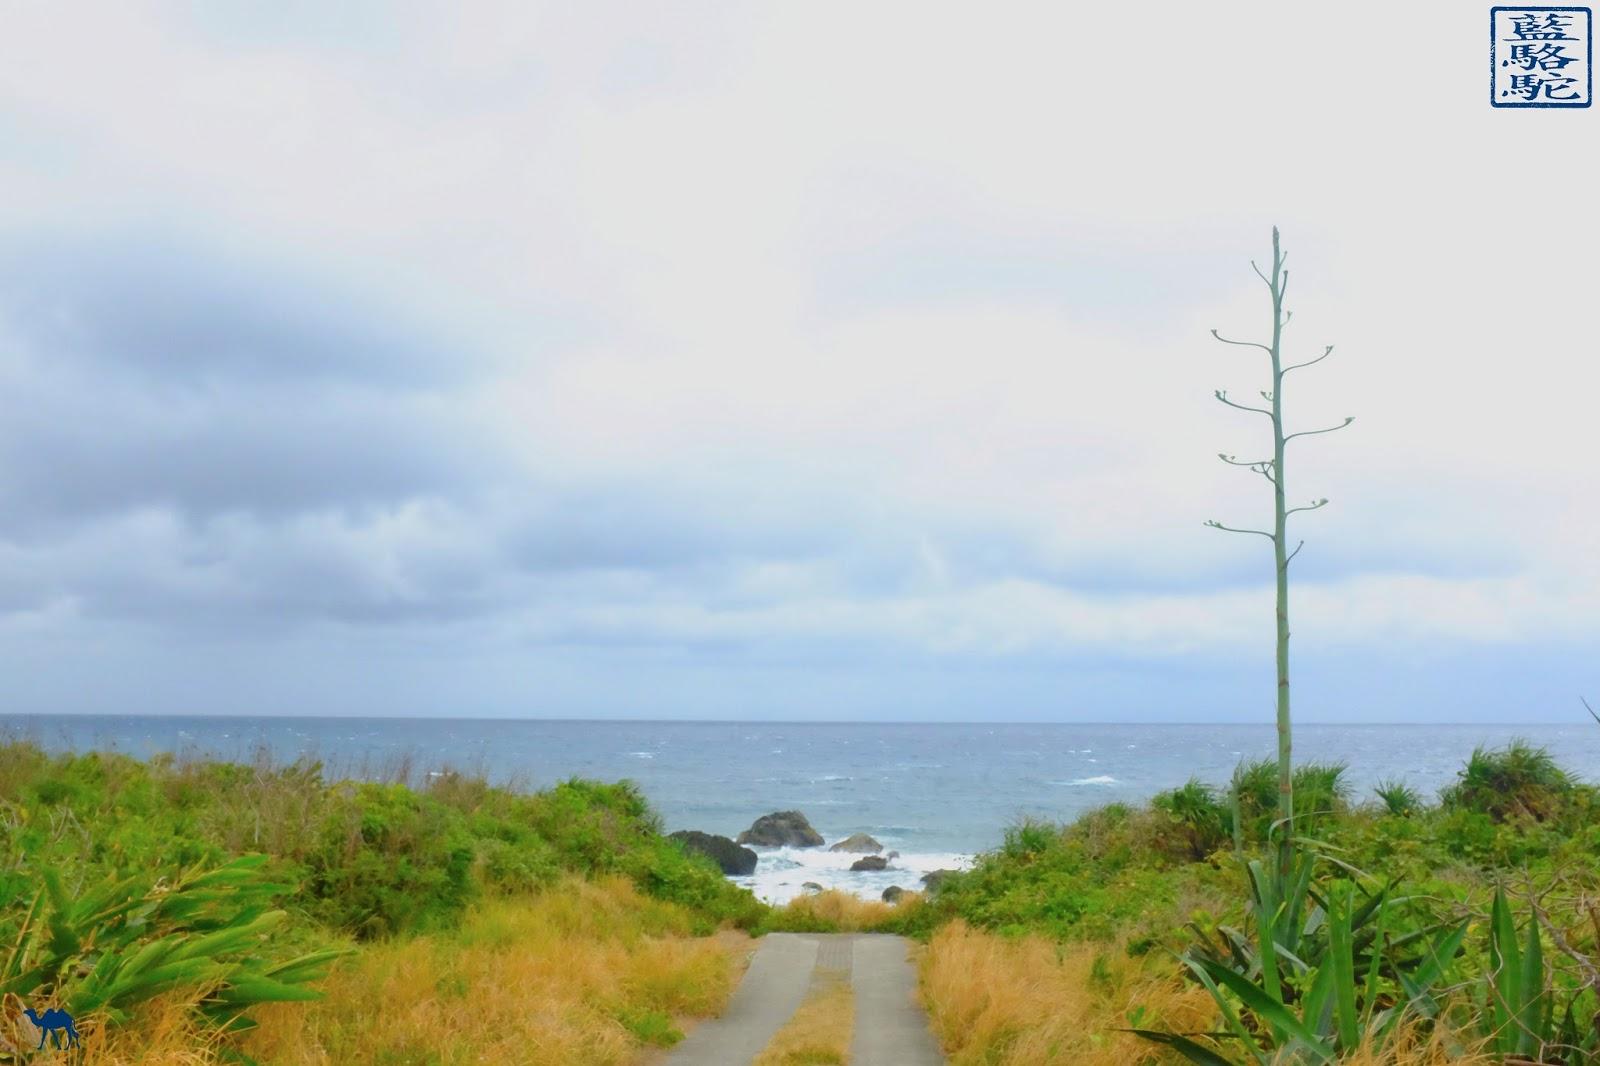 Le Chameau Bleu - Blog Voyage Taiwan - Voyage sur la cote est de Taiwan- cote taïwanaise